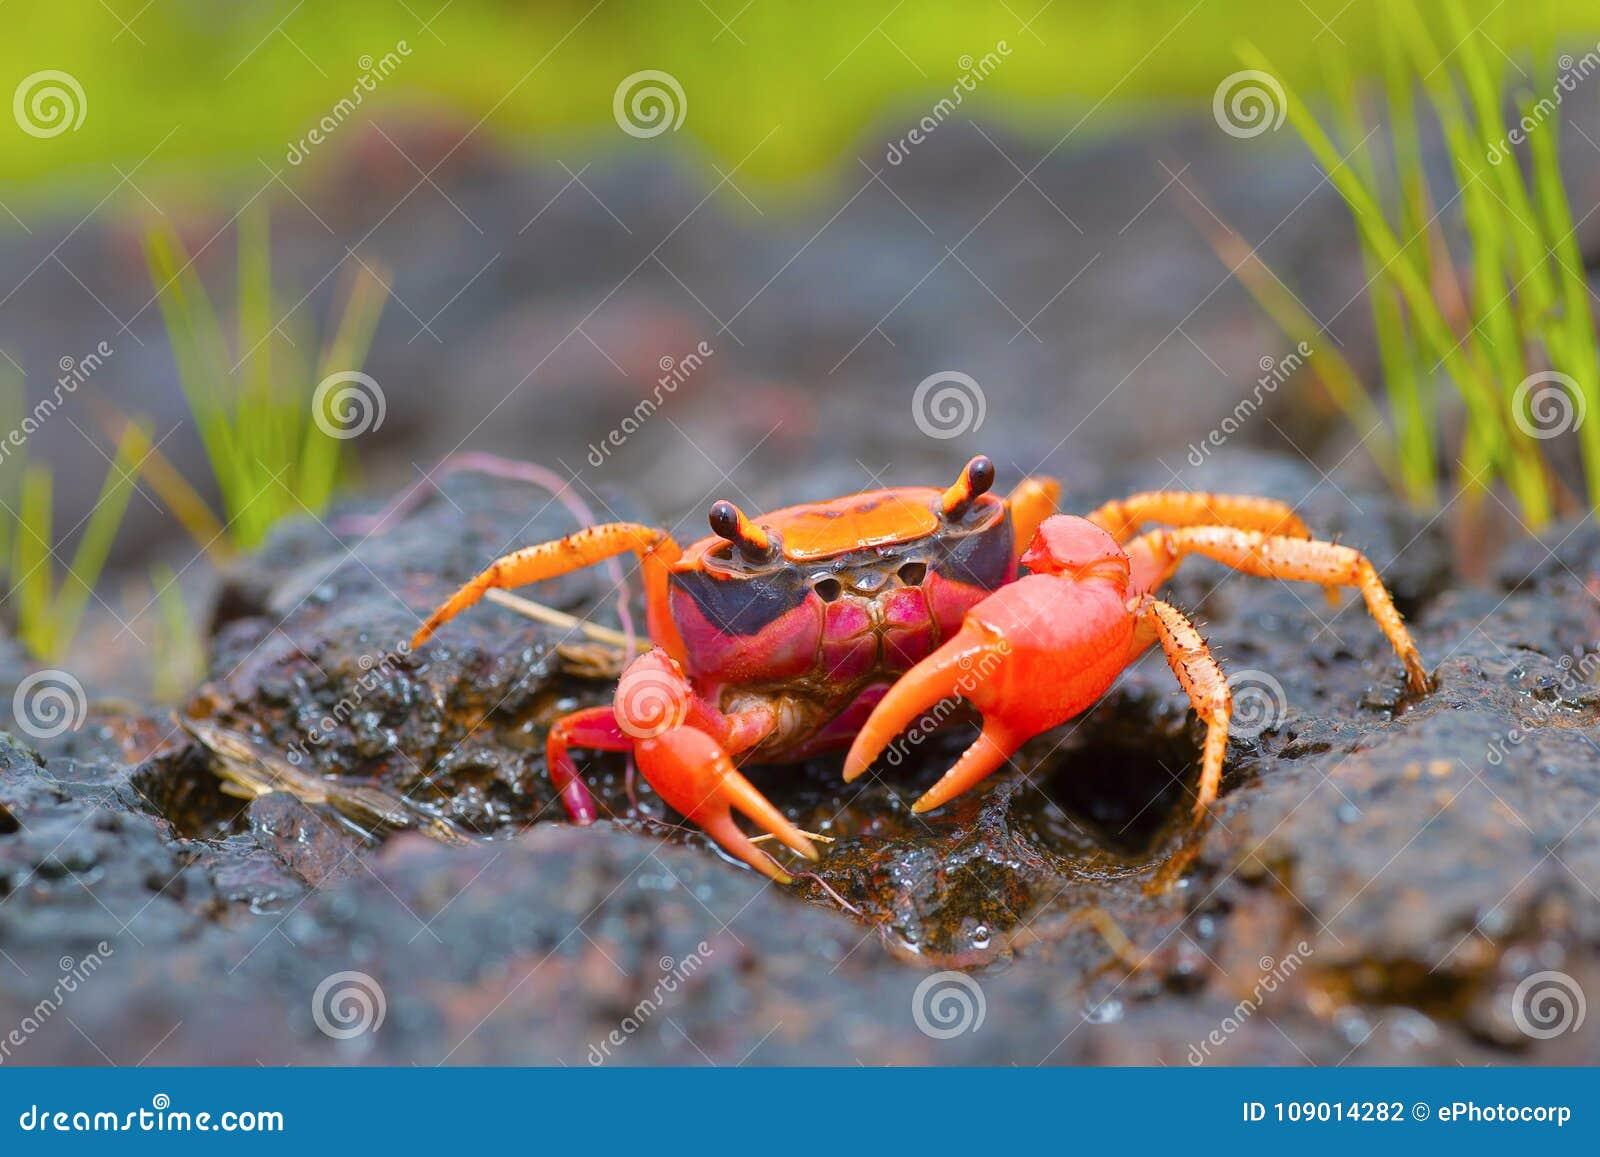 Gubernatoriana thackerayi a newly discovered species of brightly coloured freshwater crabs Satara